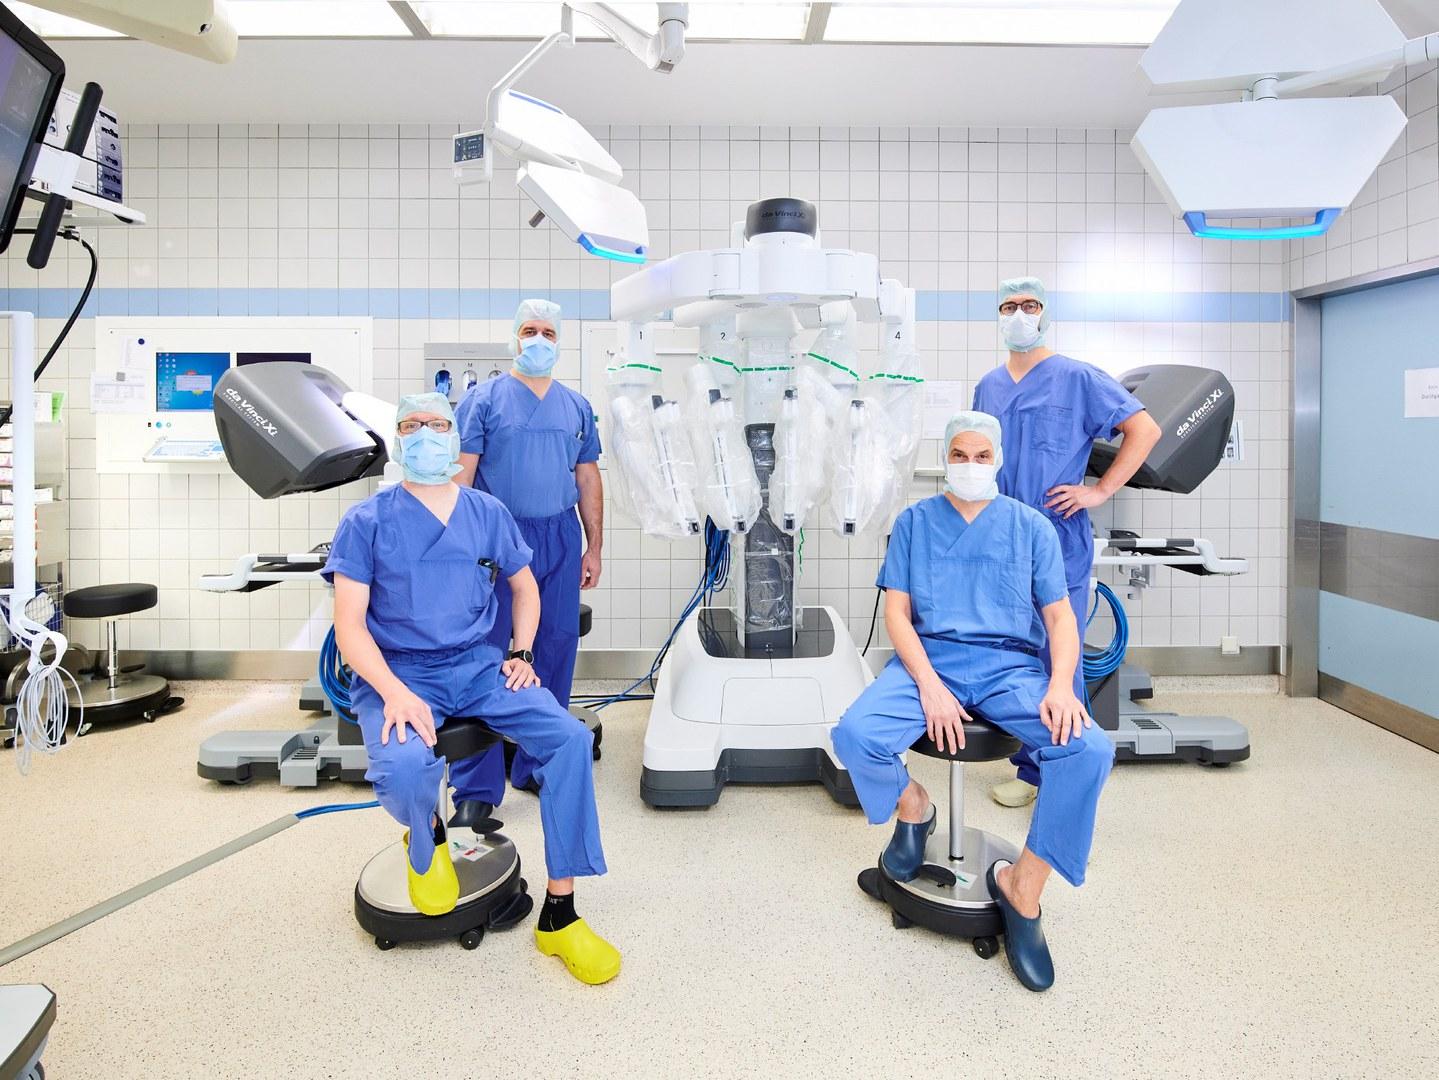 Modernstes Da Vinci Roboter-System am Universitätsklinikum Bonn: